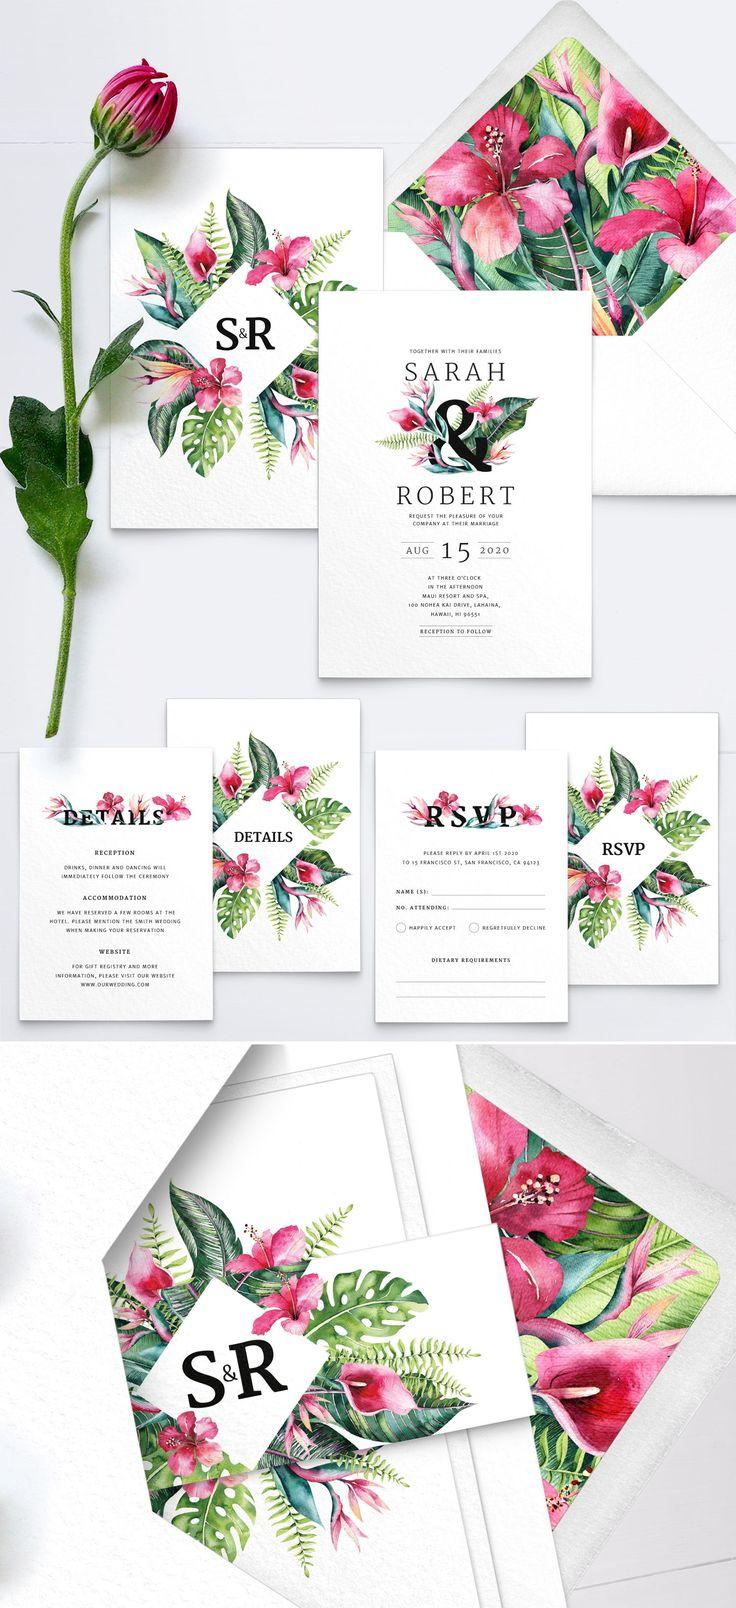 Destination Wedding Invitation Set, Tropical Wedding Invitation, Floral Beach Wedding Invitations – PRINTED on luxury Italian paper